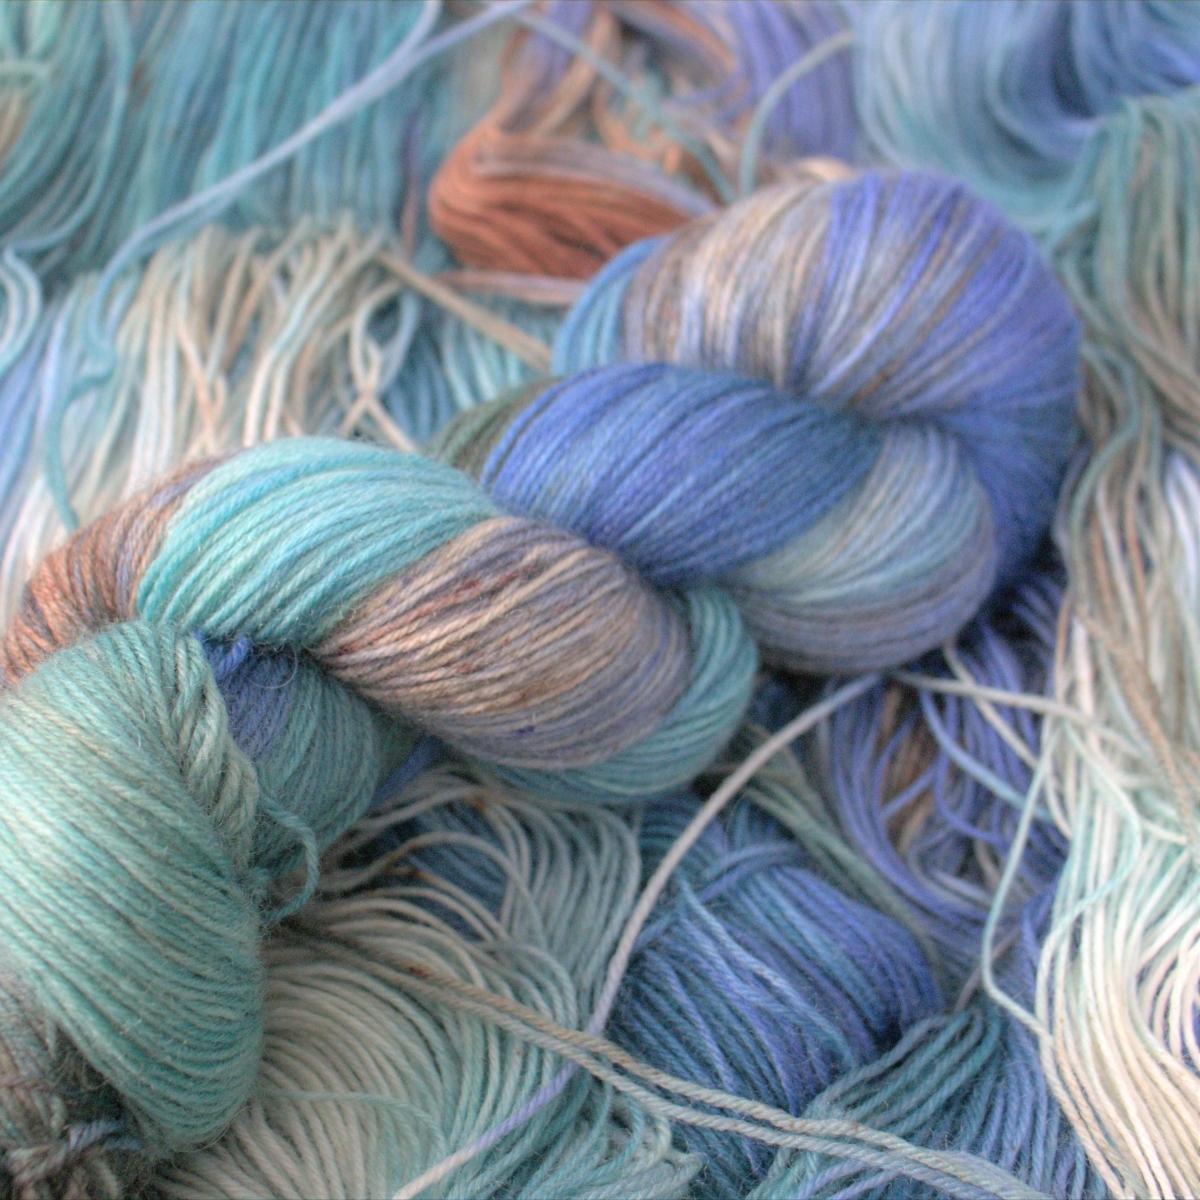 woodico.pro hand dyed yarn 052 2 1200x1200 - Hand dyed yarn / 052